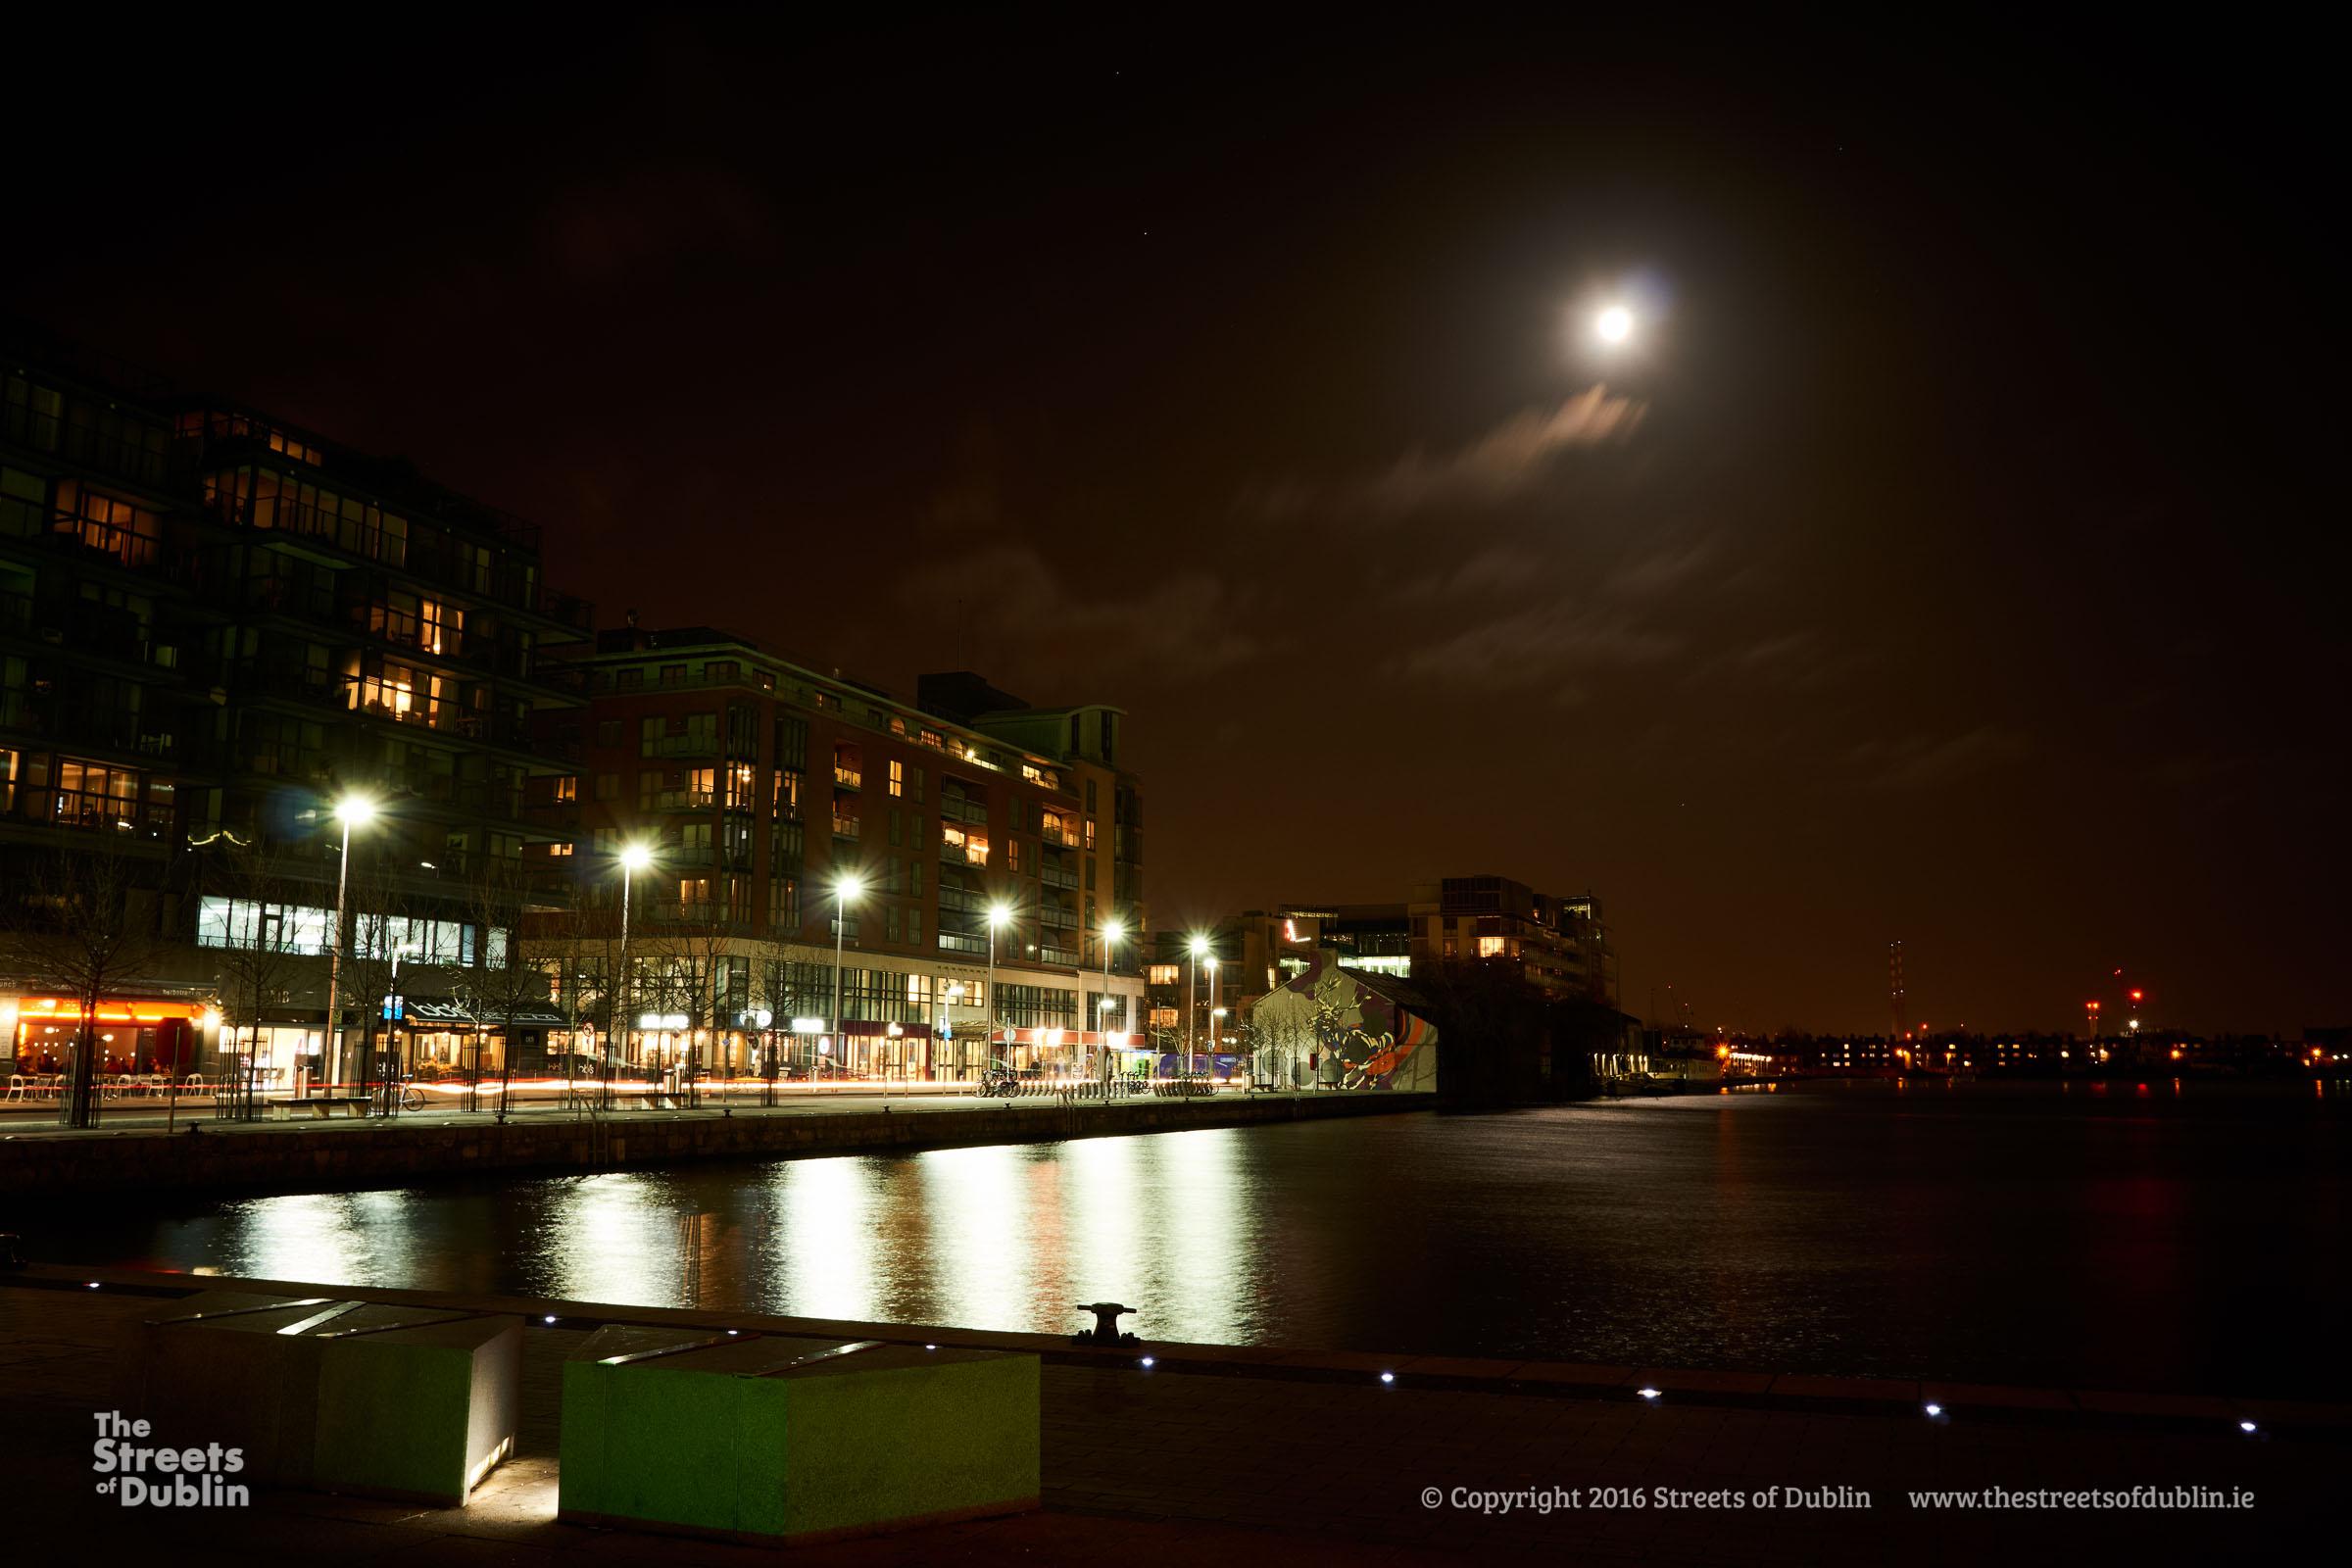 Streets-of-Dublin-Photo-12.jpg